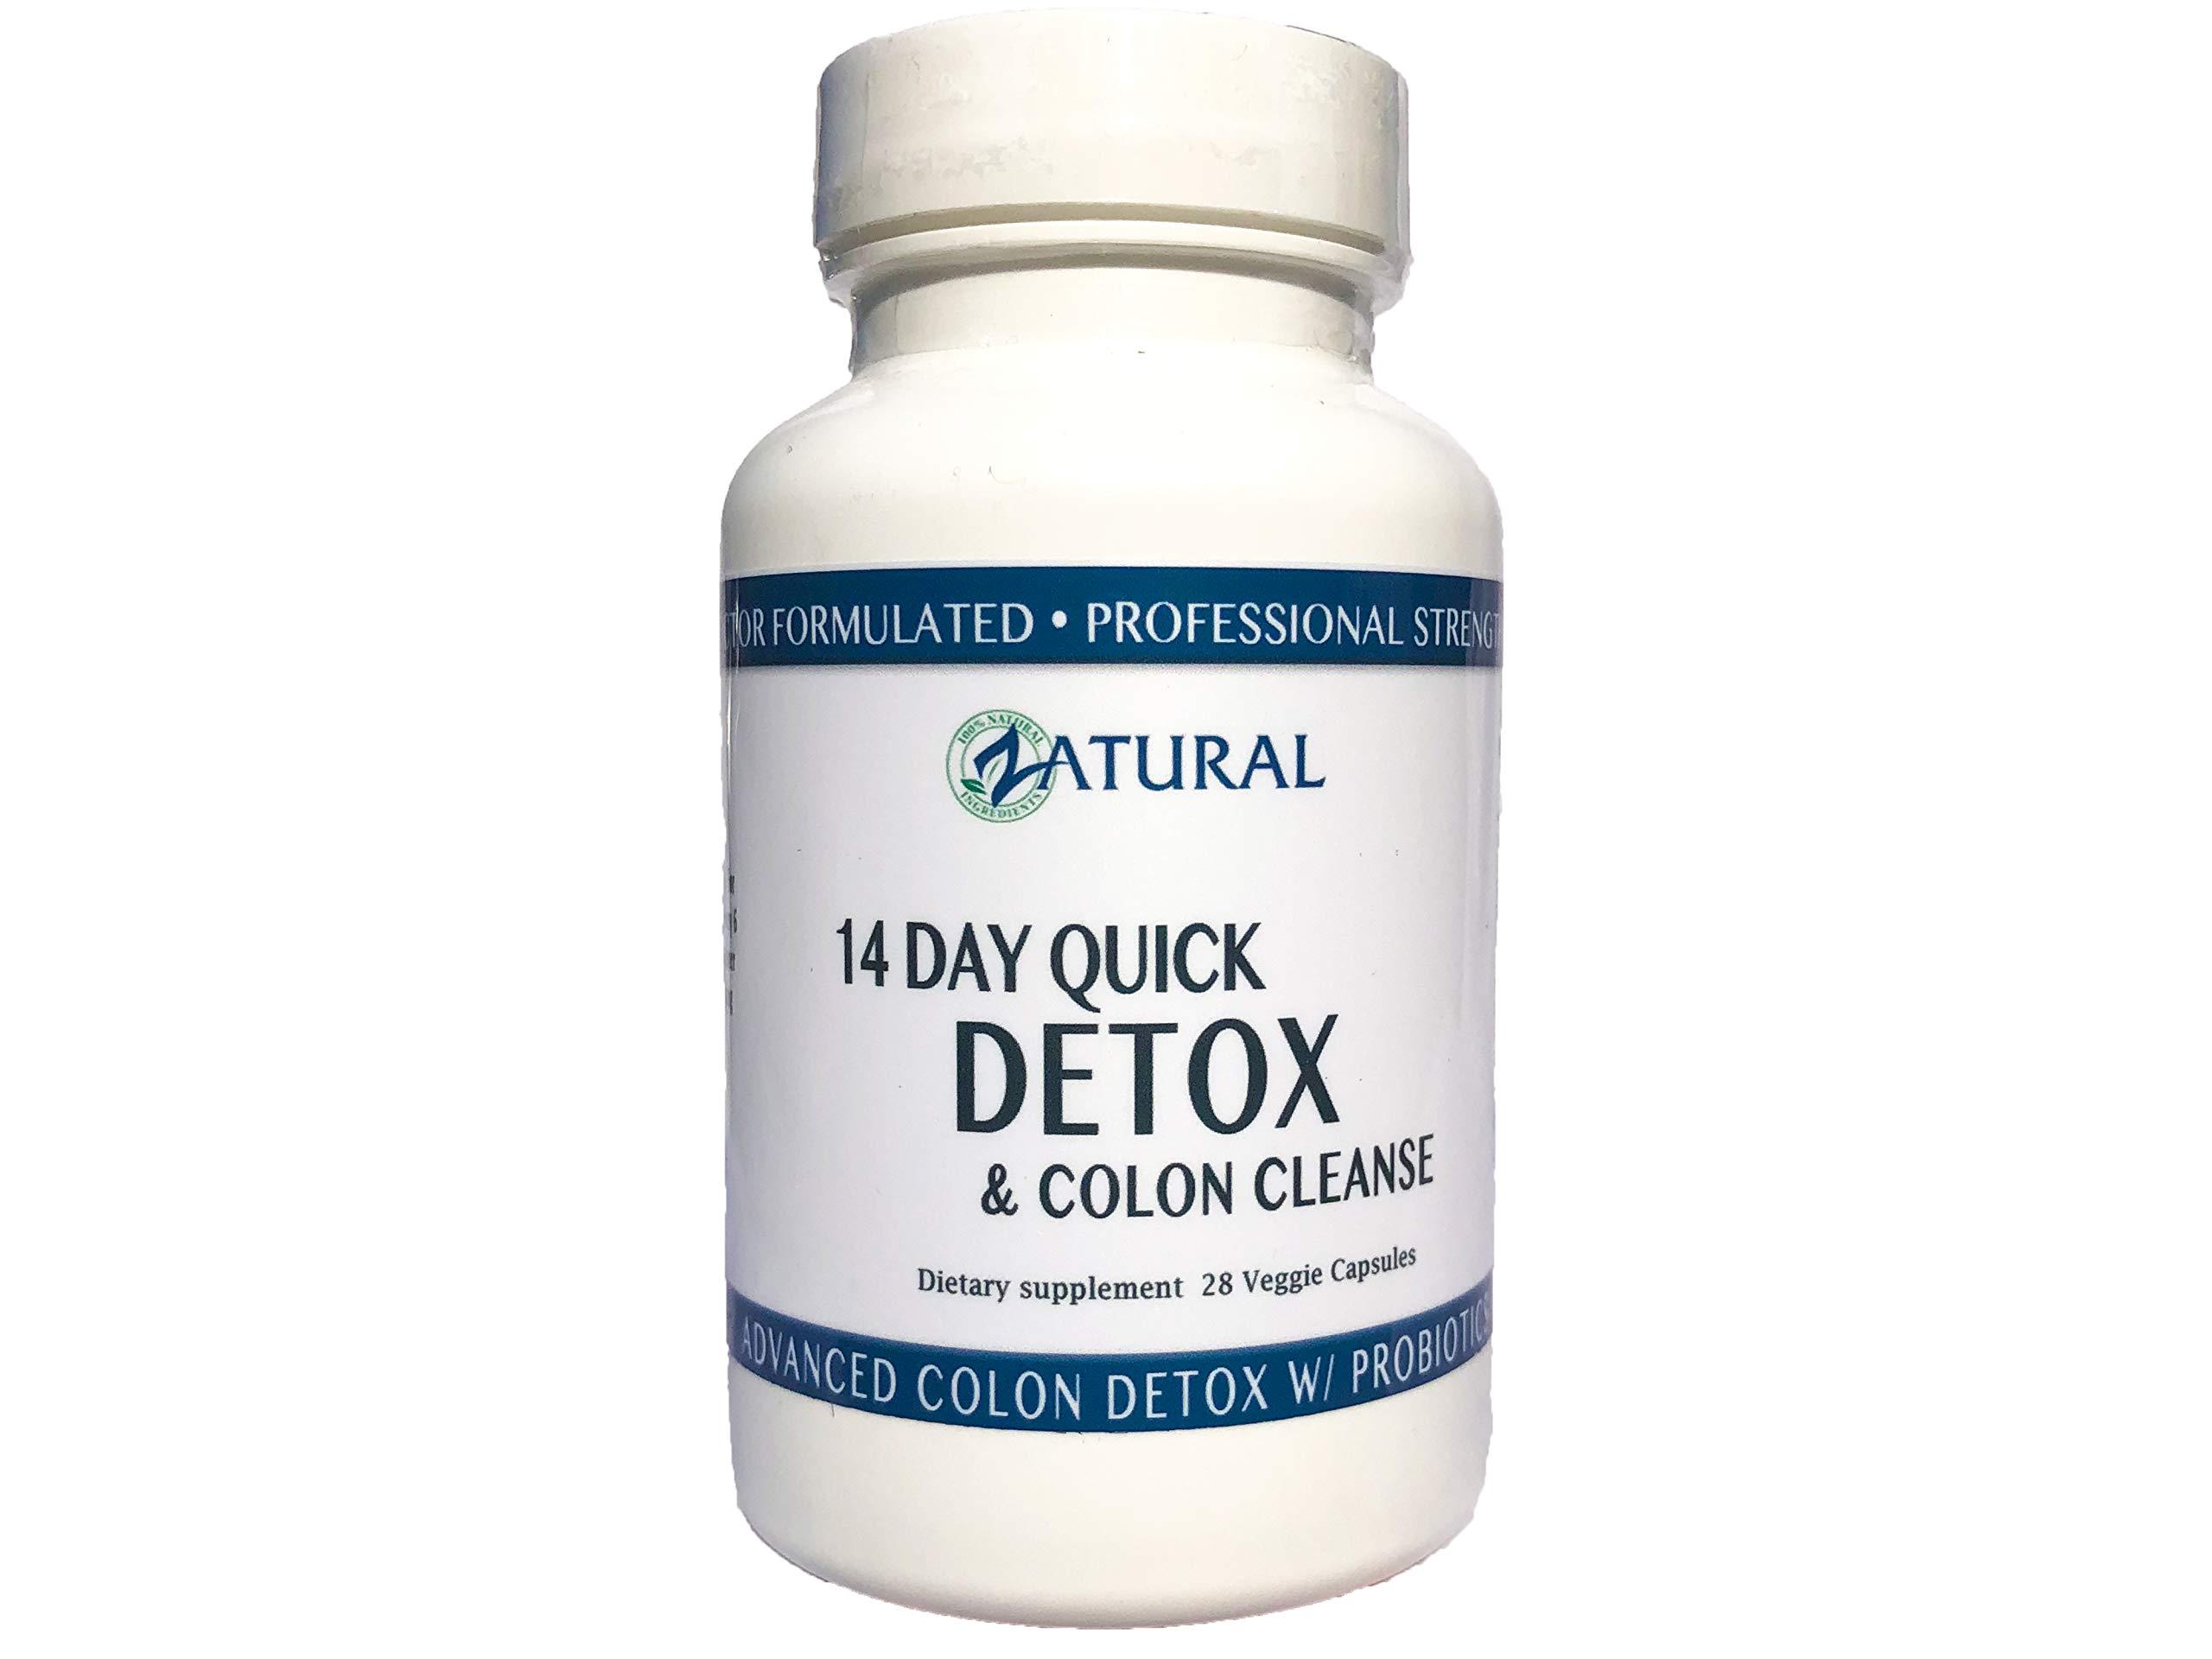 Colon Cleanse Detox_w/ Probiotics_Doctor Formulated_Colon Detox_Colon Health_Colon Weight Loss_Increased Energy Levels_Super Colon Cleanse (14 Day Quick)